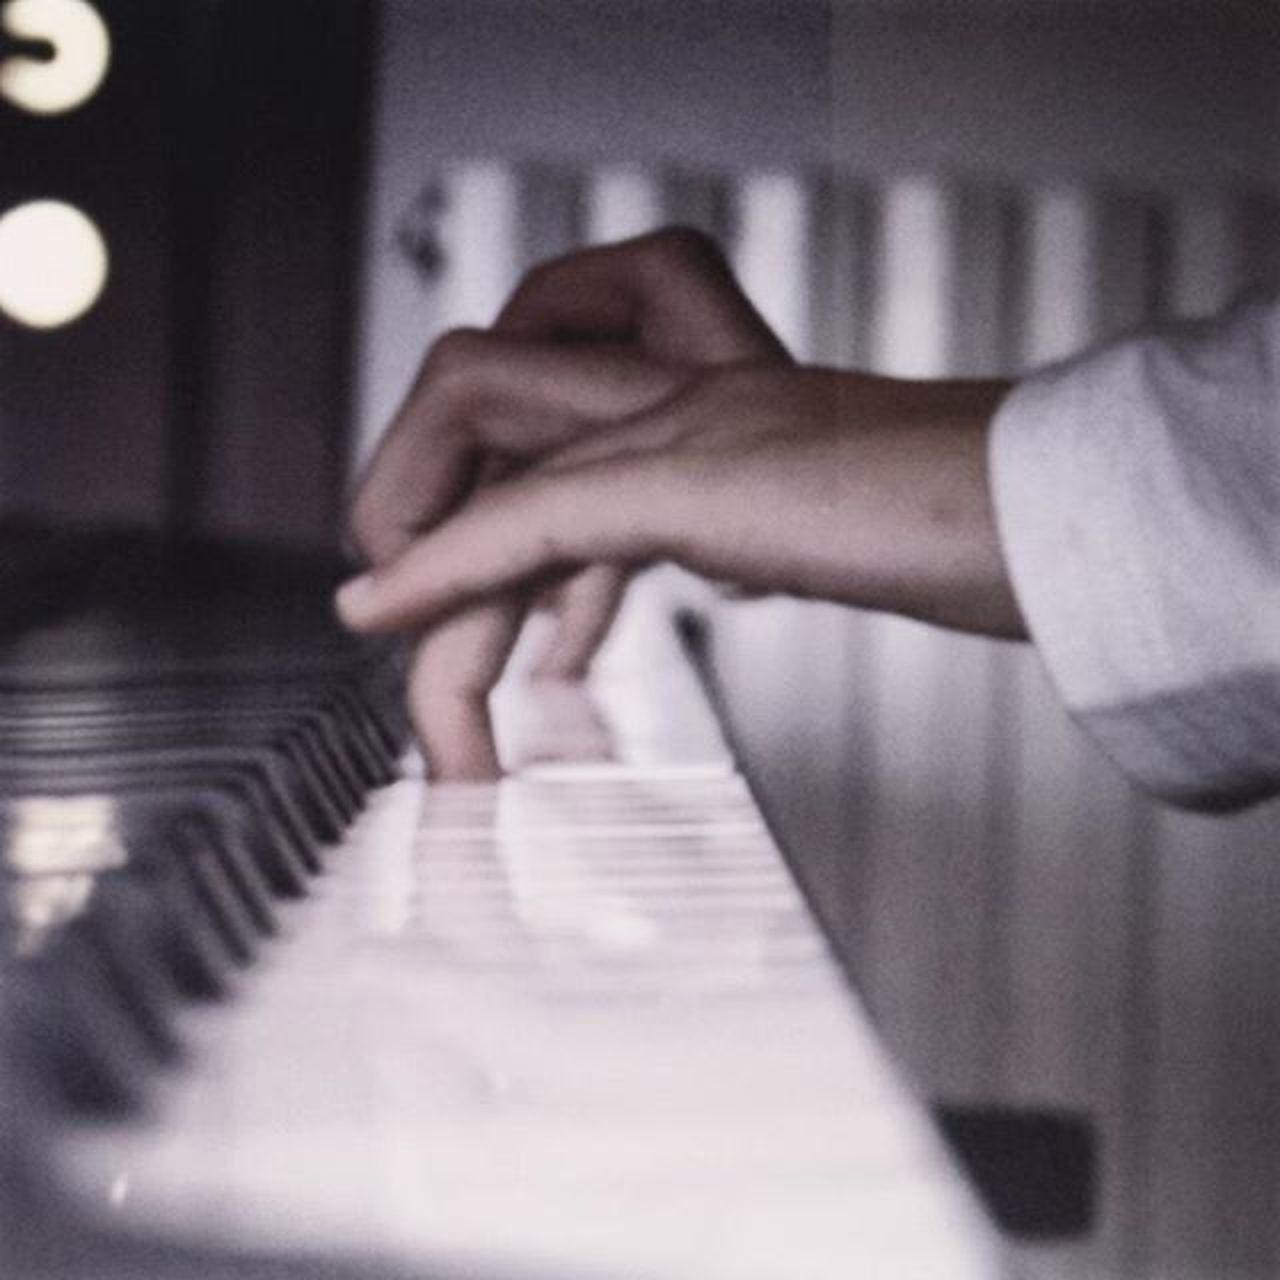 Natale2015 Ziaenipote Nipote Piano Pianoforte Love Girl Bestoftheday Smile Happy Fun Hand EyeEm Best Shots Eye4photography  EyeEm Gallery EyeEm Best Edits EyeEmBestPics Eyeemphotography EyeEmbestshots